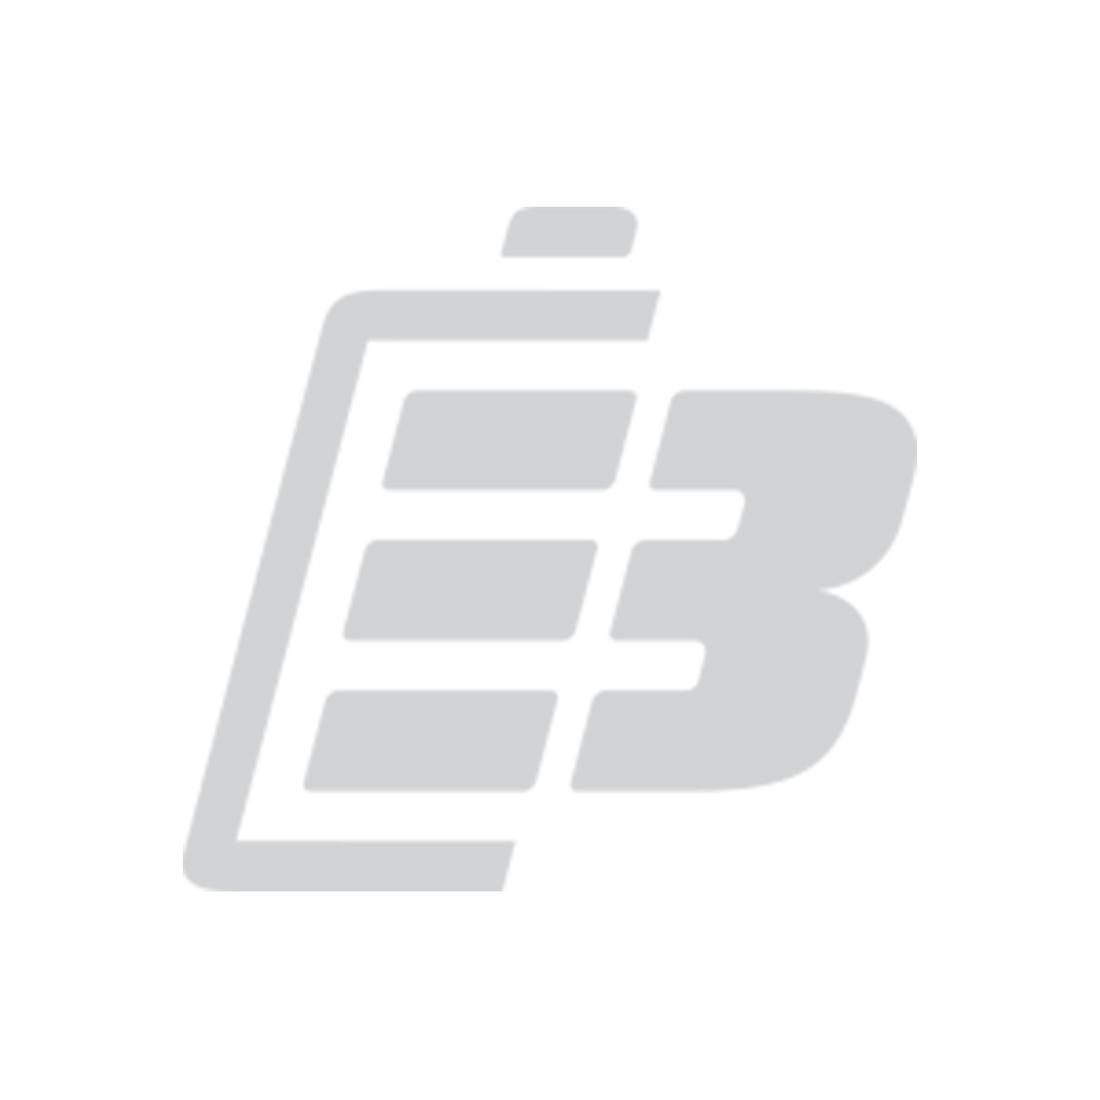 Crane remote control battery Hiab Hi Drive 4000_1